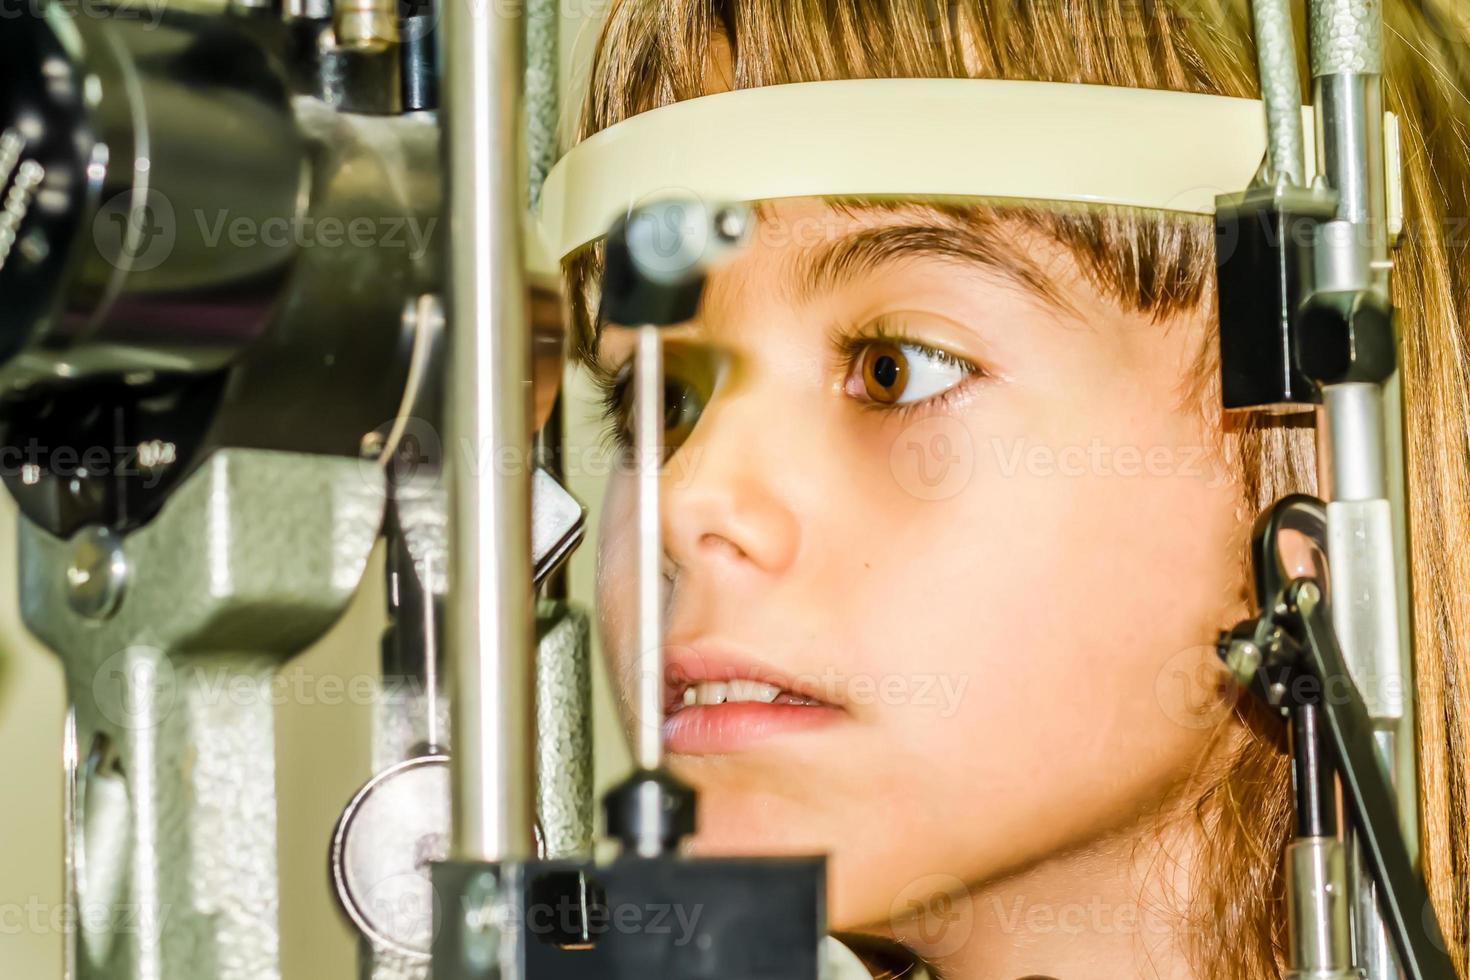 litlle garota fazendo o exame oftalmológico foto